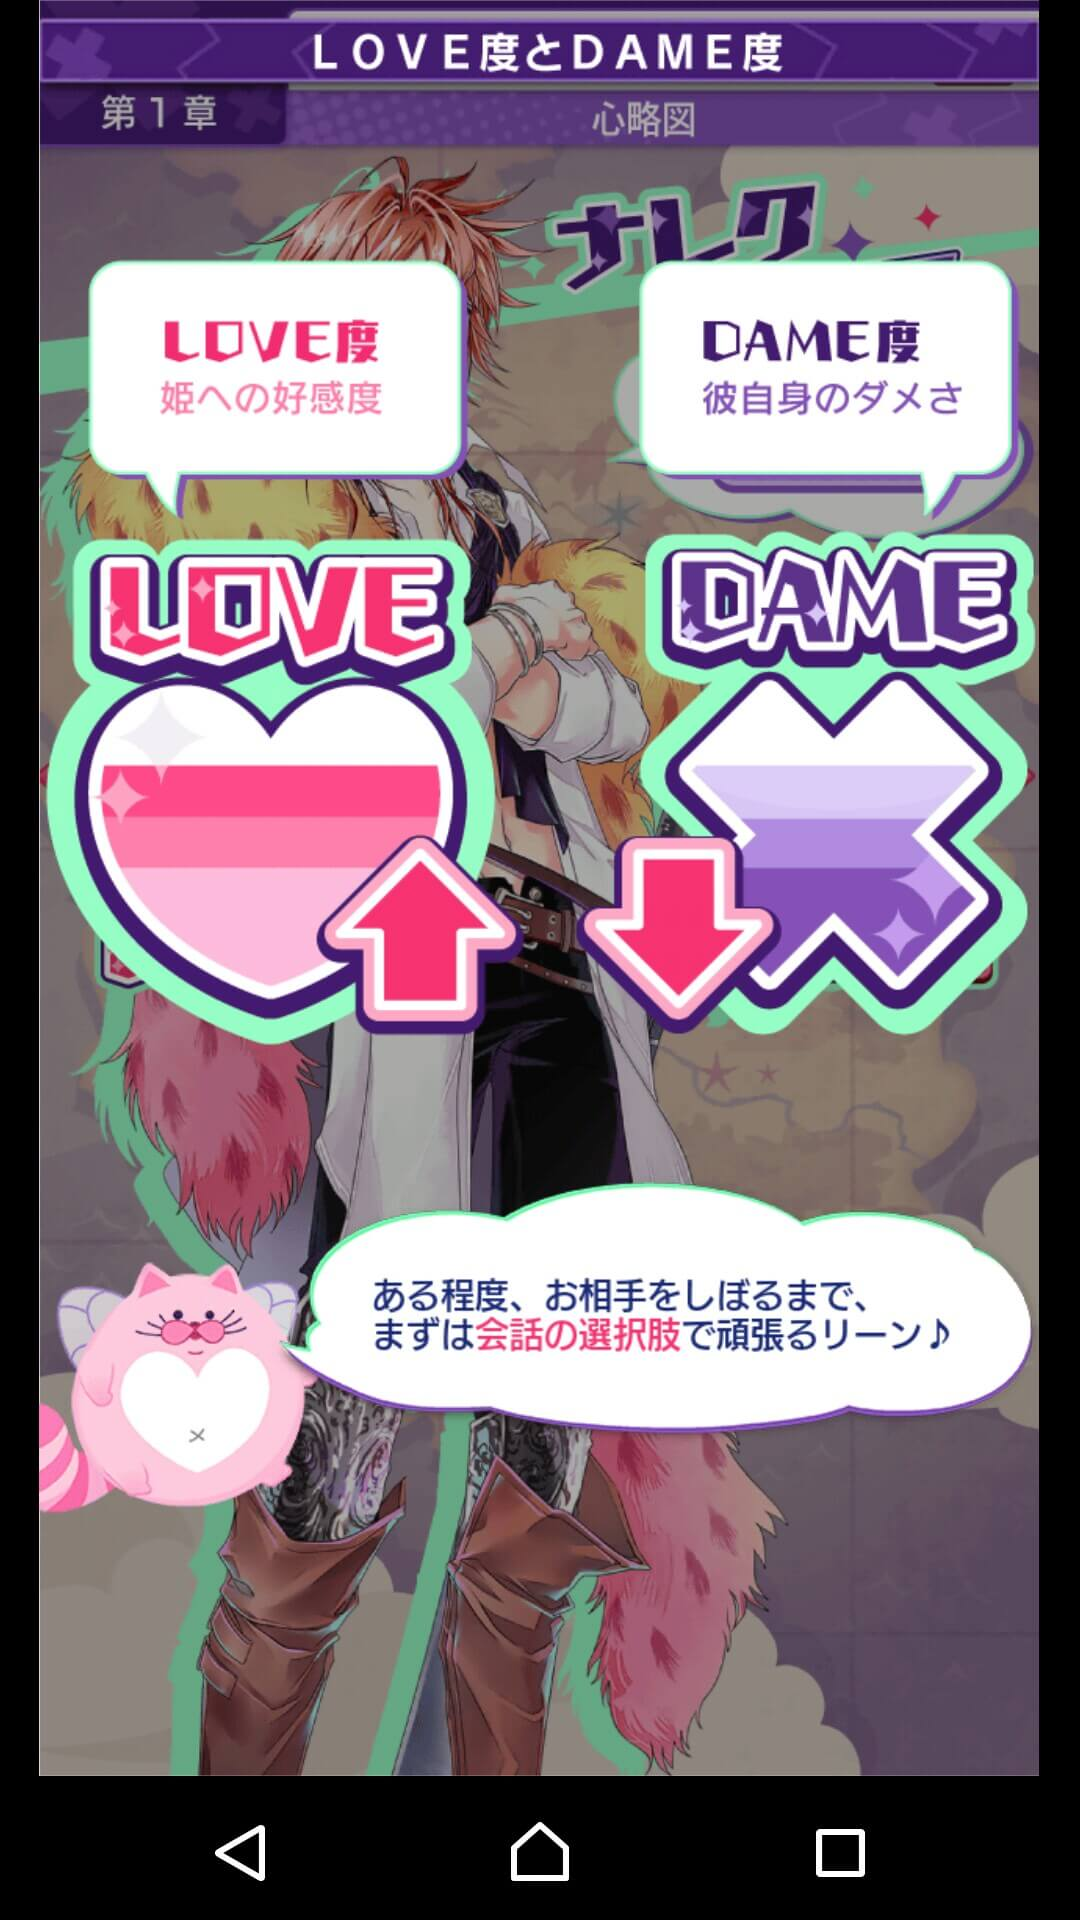 DAME×PRINCE15 ゲームシステム説明画面